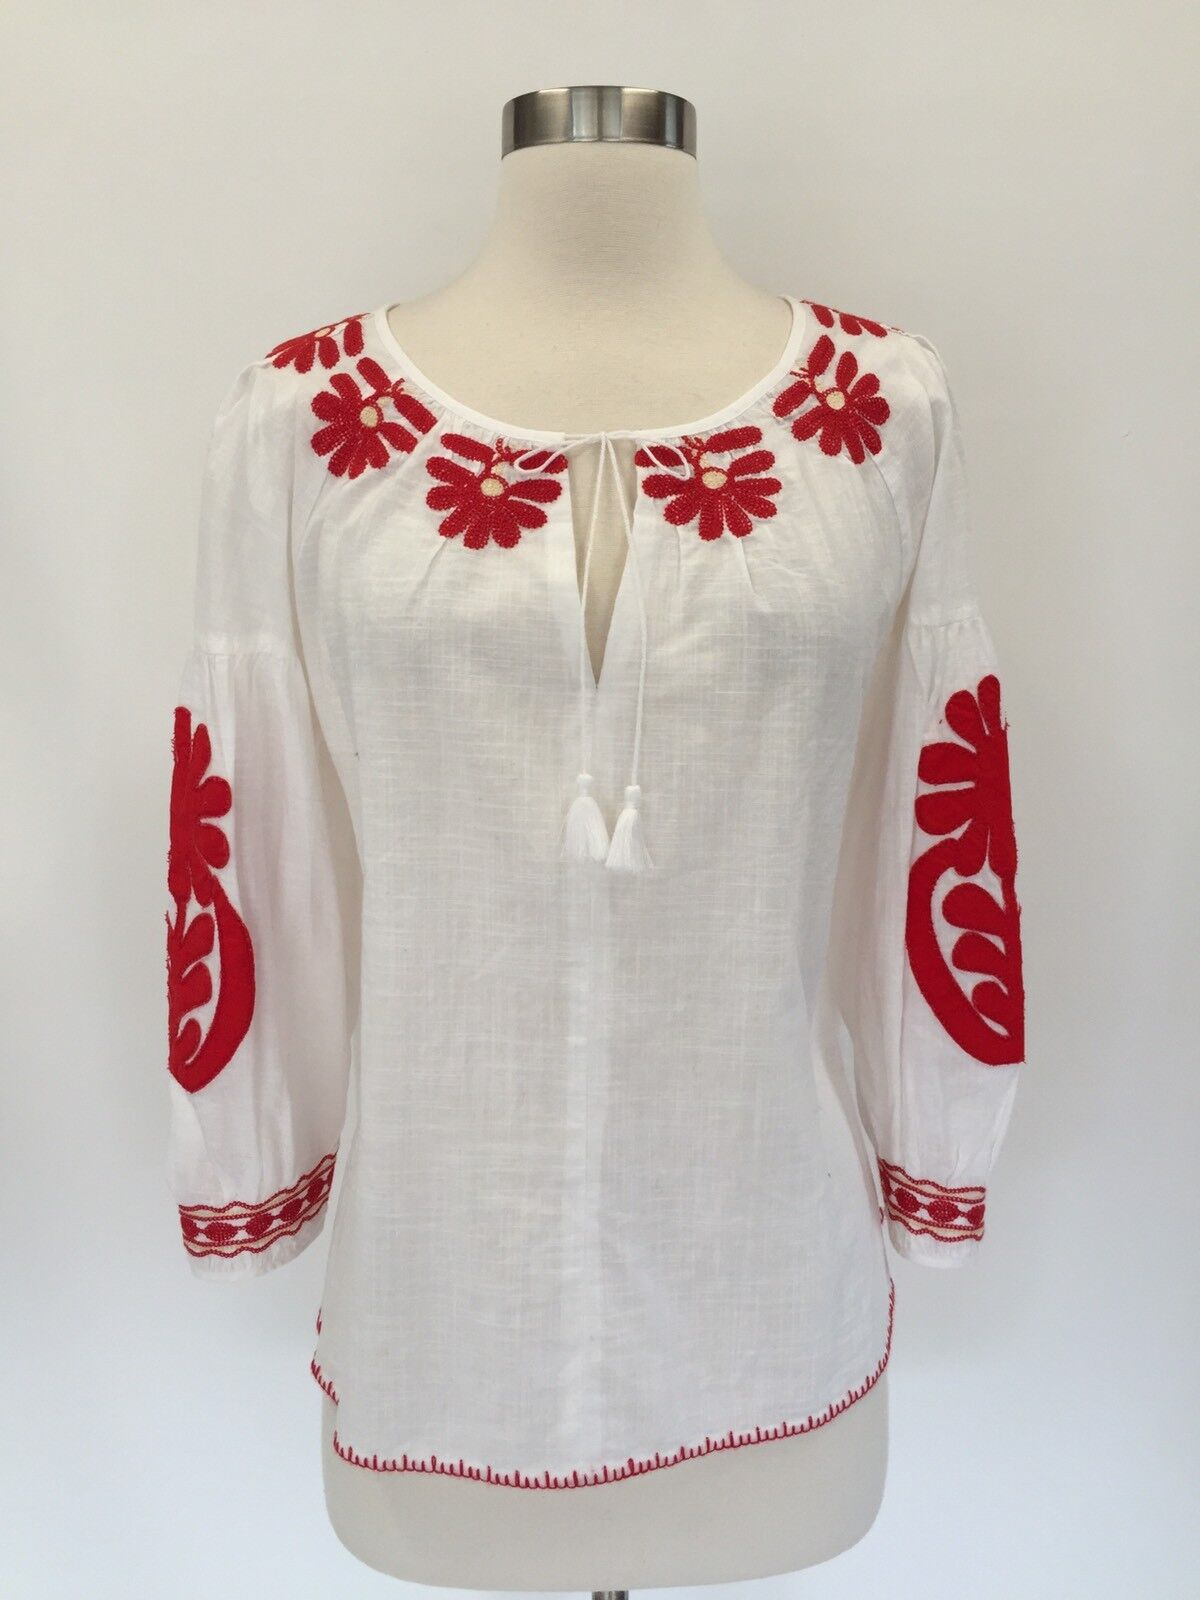 New Madewell Embroiderot Weißa Top Blouse Weiß Sz M Medium